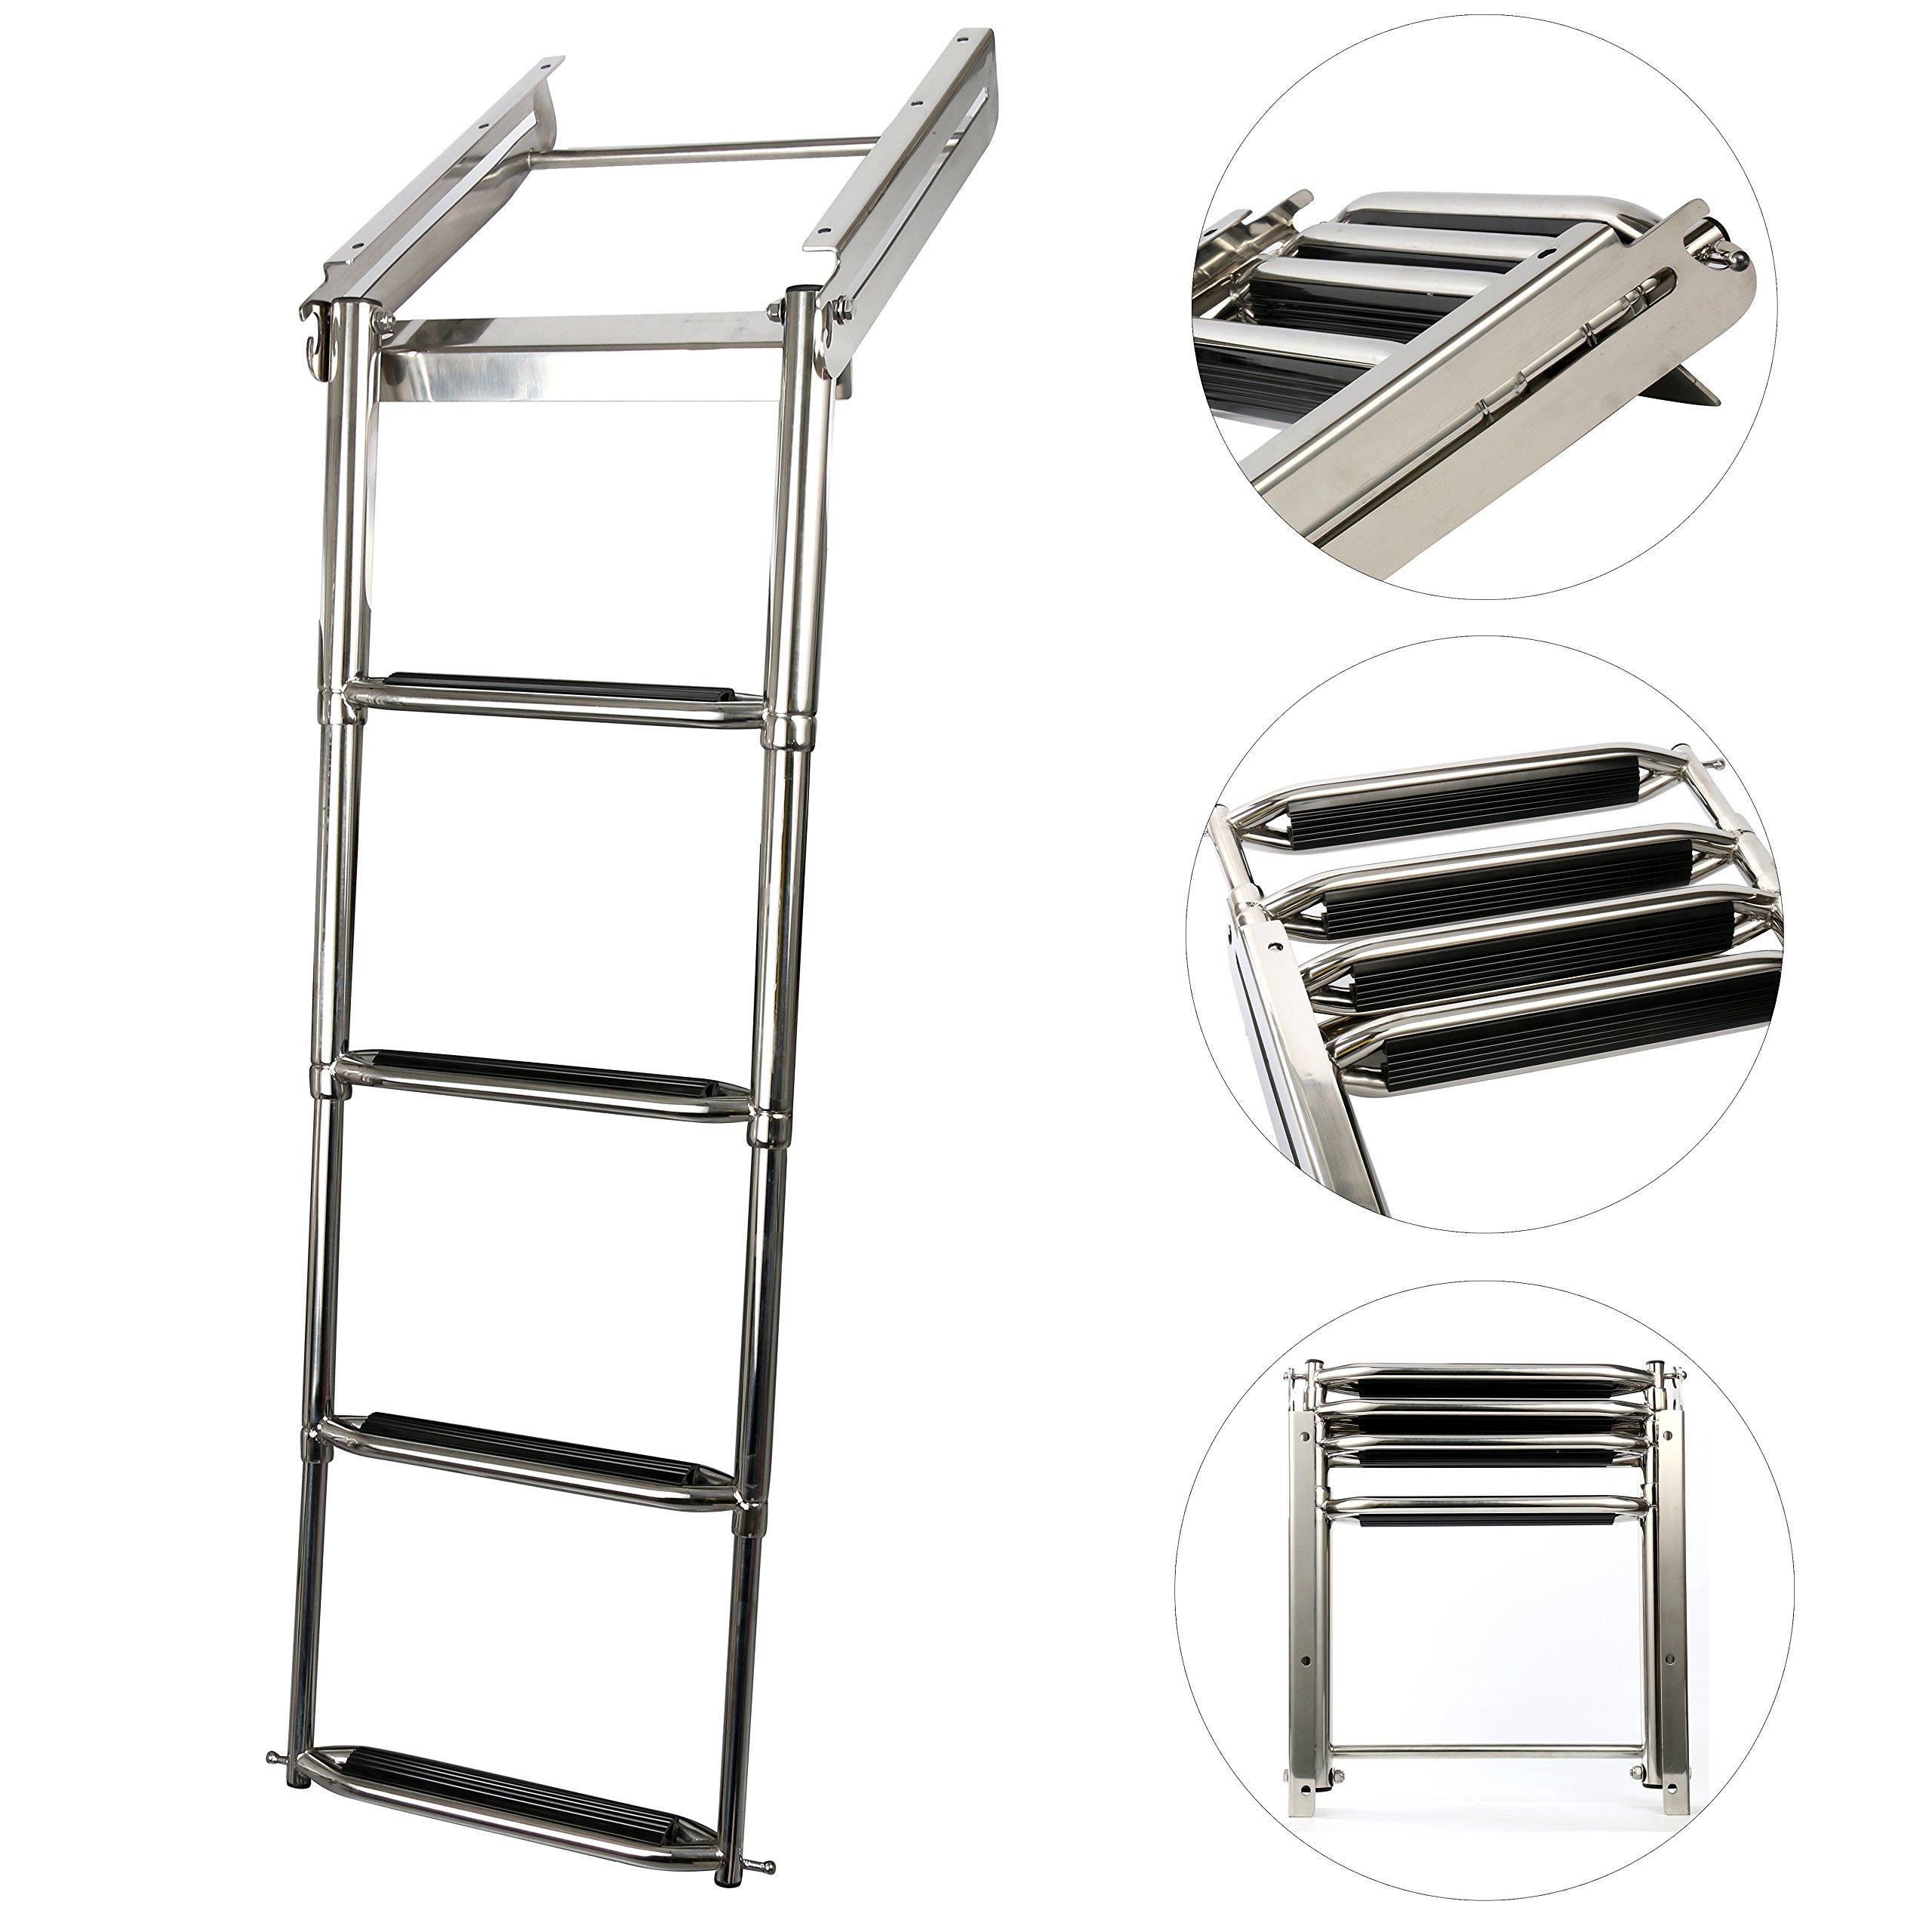 Amarine-made 4-step Under Platform Slide Mount Boat Boarding Ladder, Telescoping, Stainless Steel